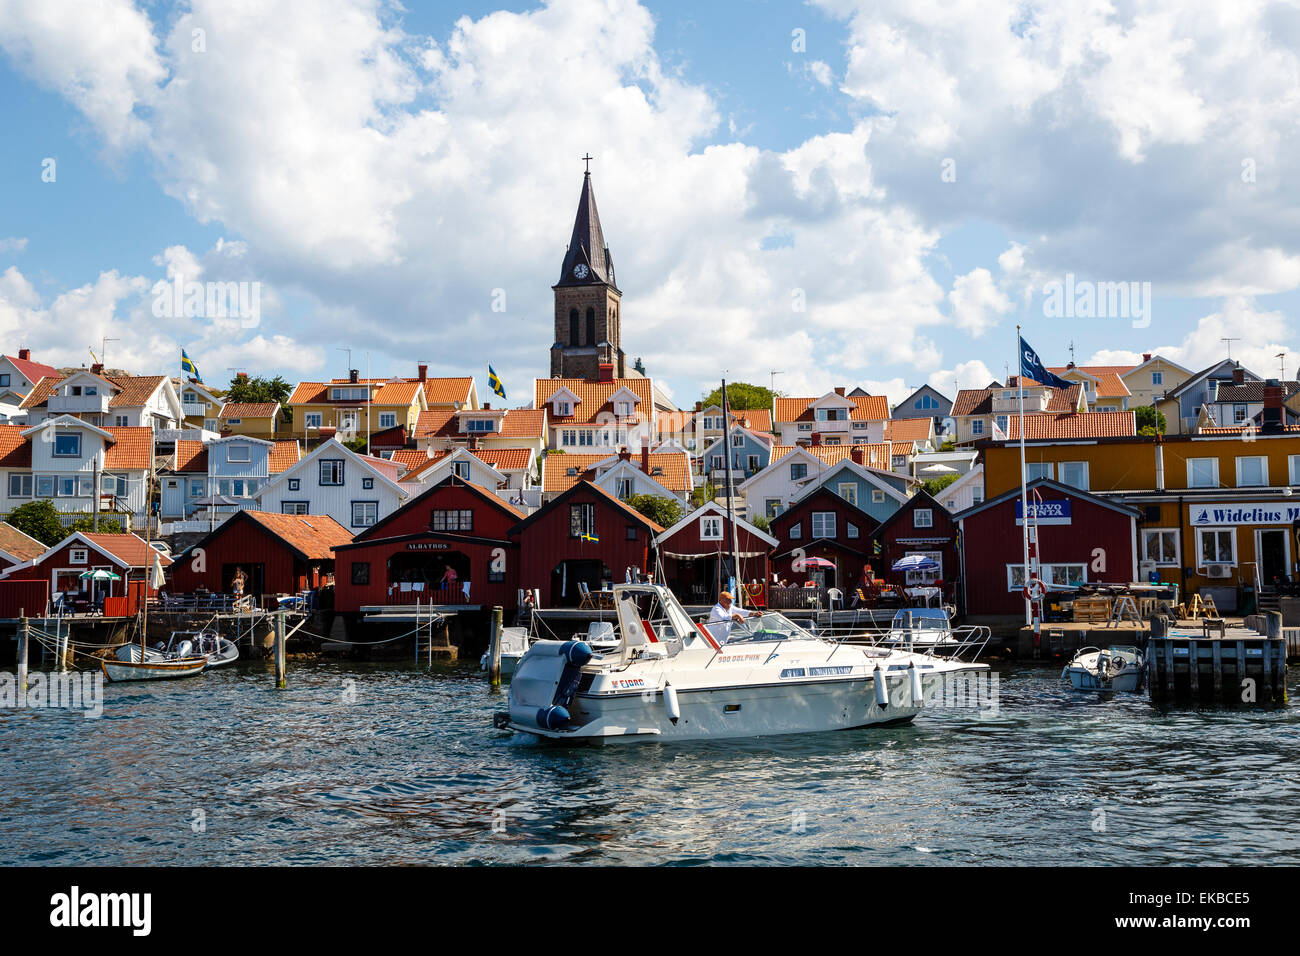 Bohuslan Fjallbacka, región, costa oeste, Suecia, Escandinavia, Europa Foto de stock